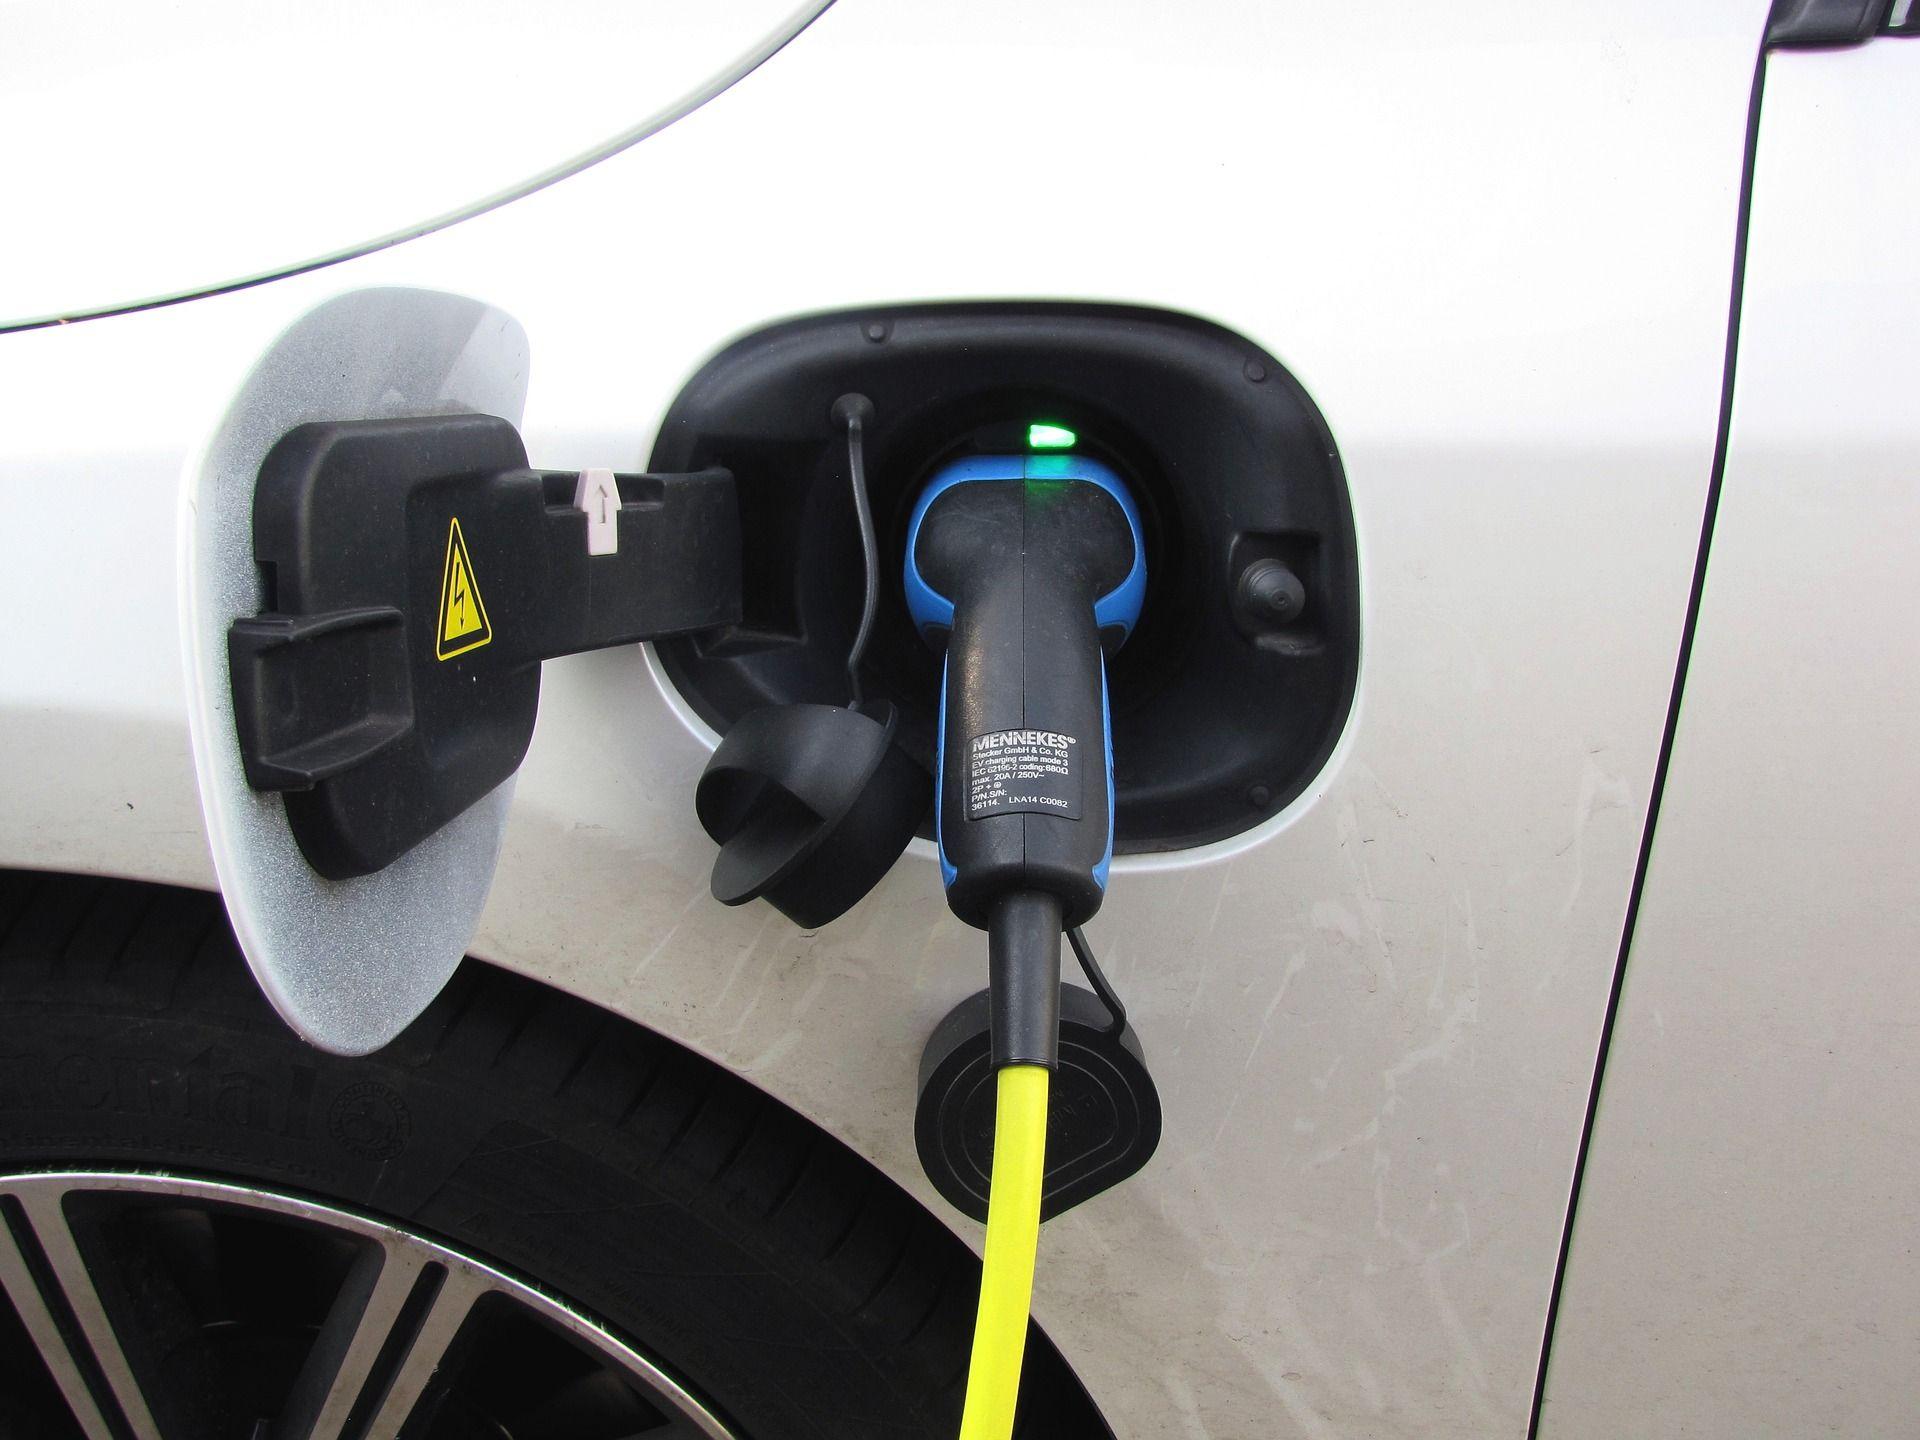 Puntos de recarga para vehículos eléctricos